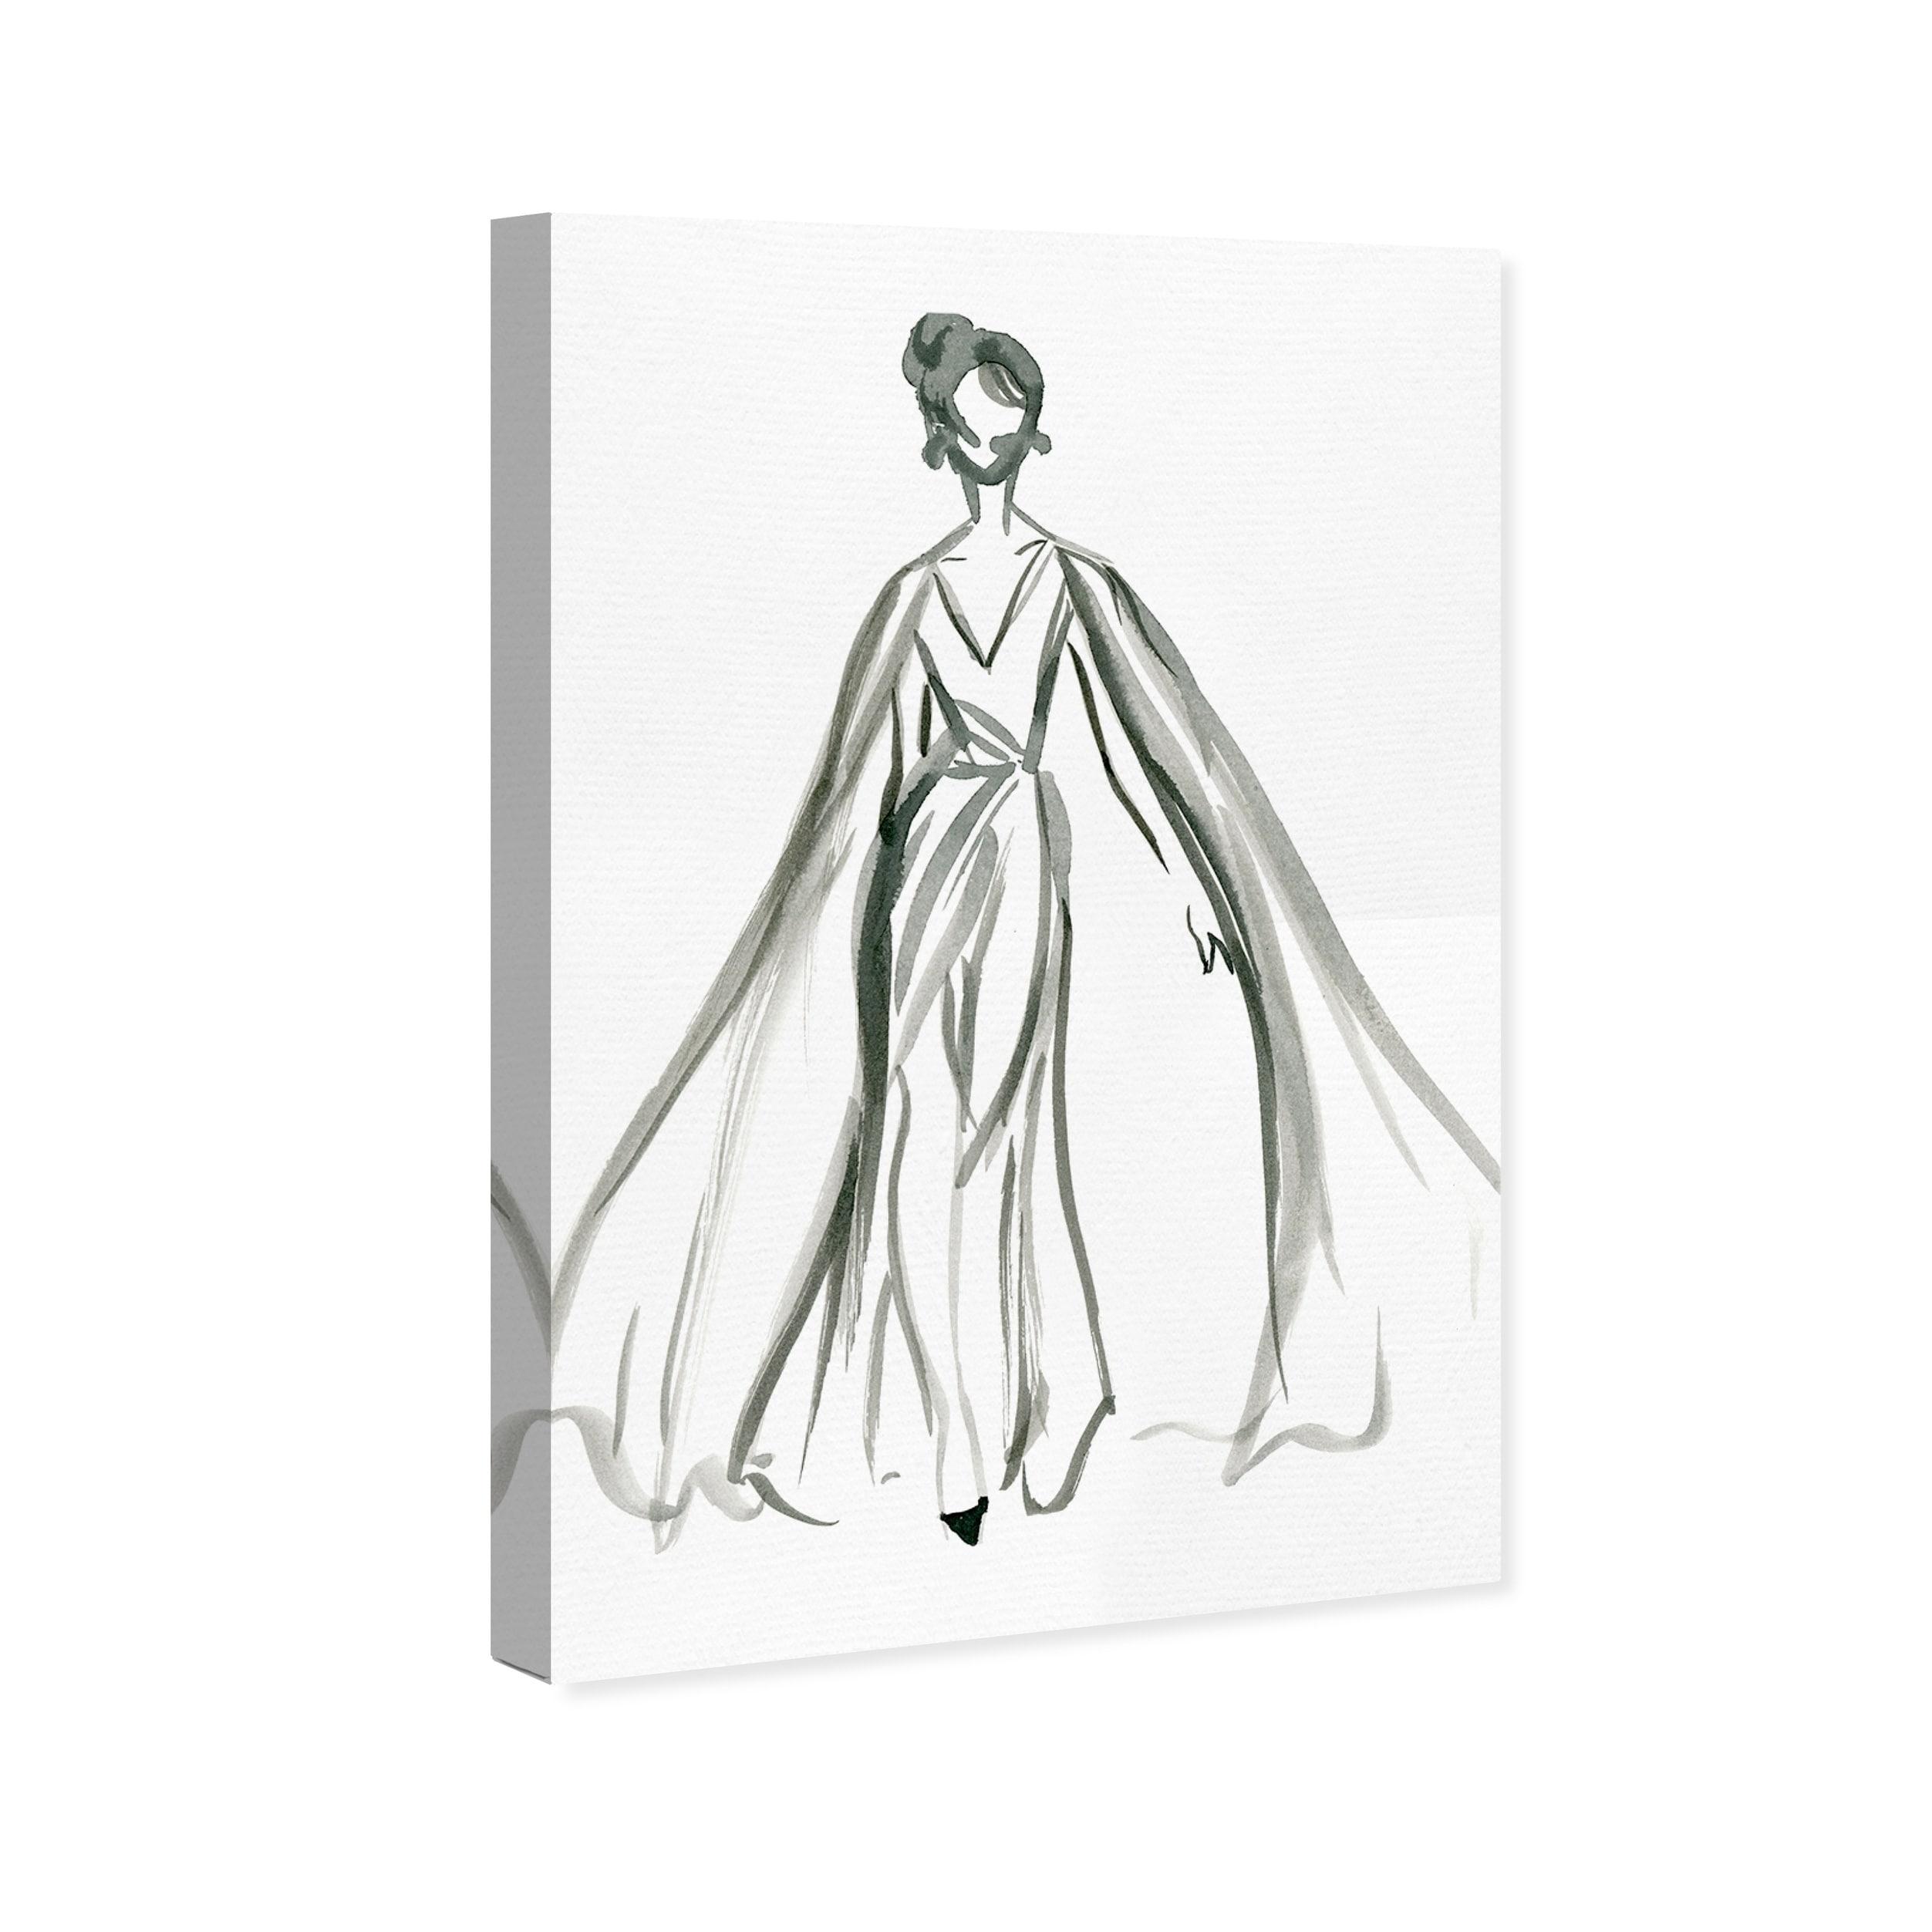 Shop Oliver Gal Elegant Dress Ink V Fashion And Glam Wall Art Canvas Print Black White Overstock 18219396